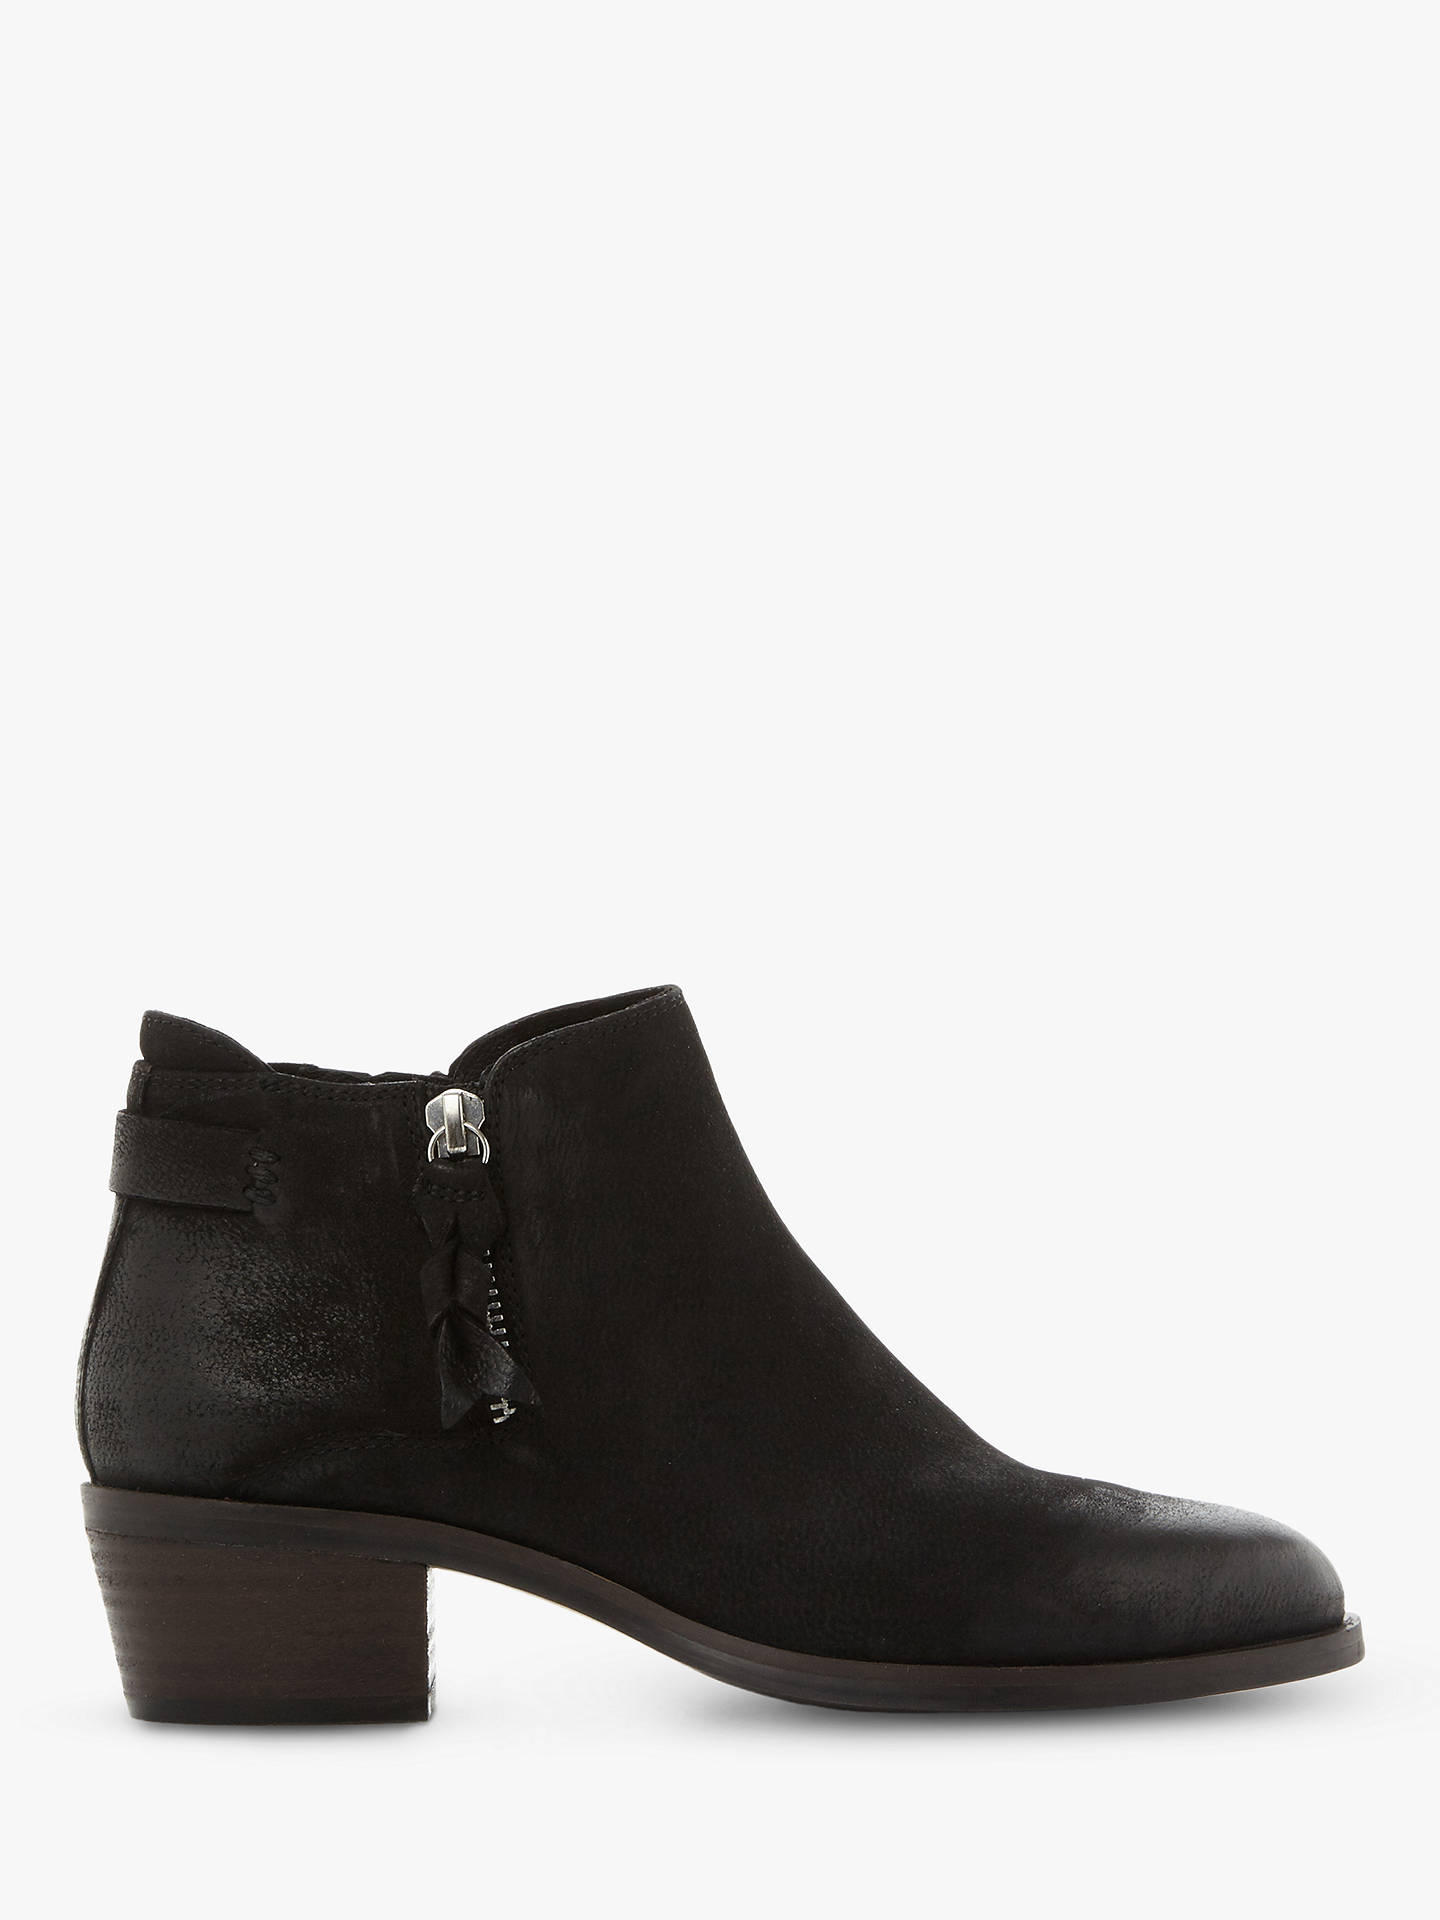 438892c61e0 Buy Steve Madden Kyle Block Heeled Ankle Chelsea Boots